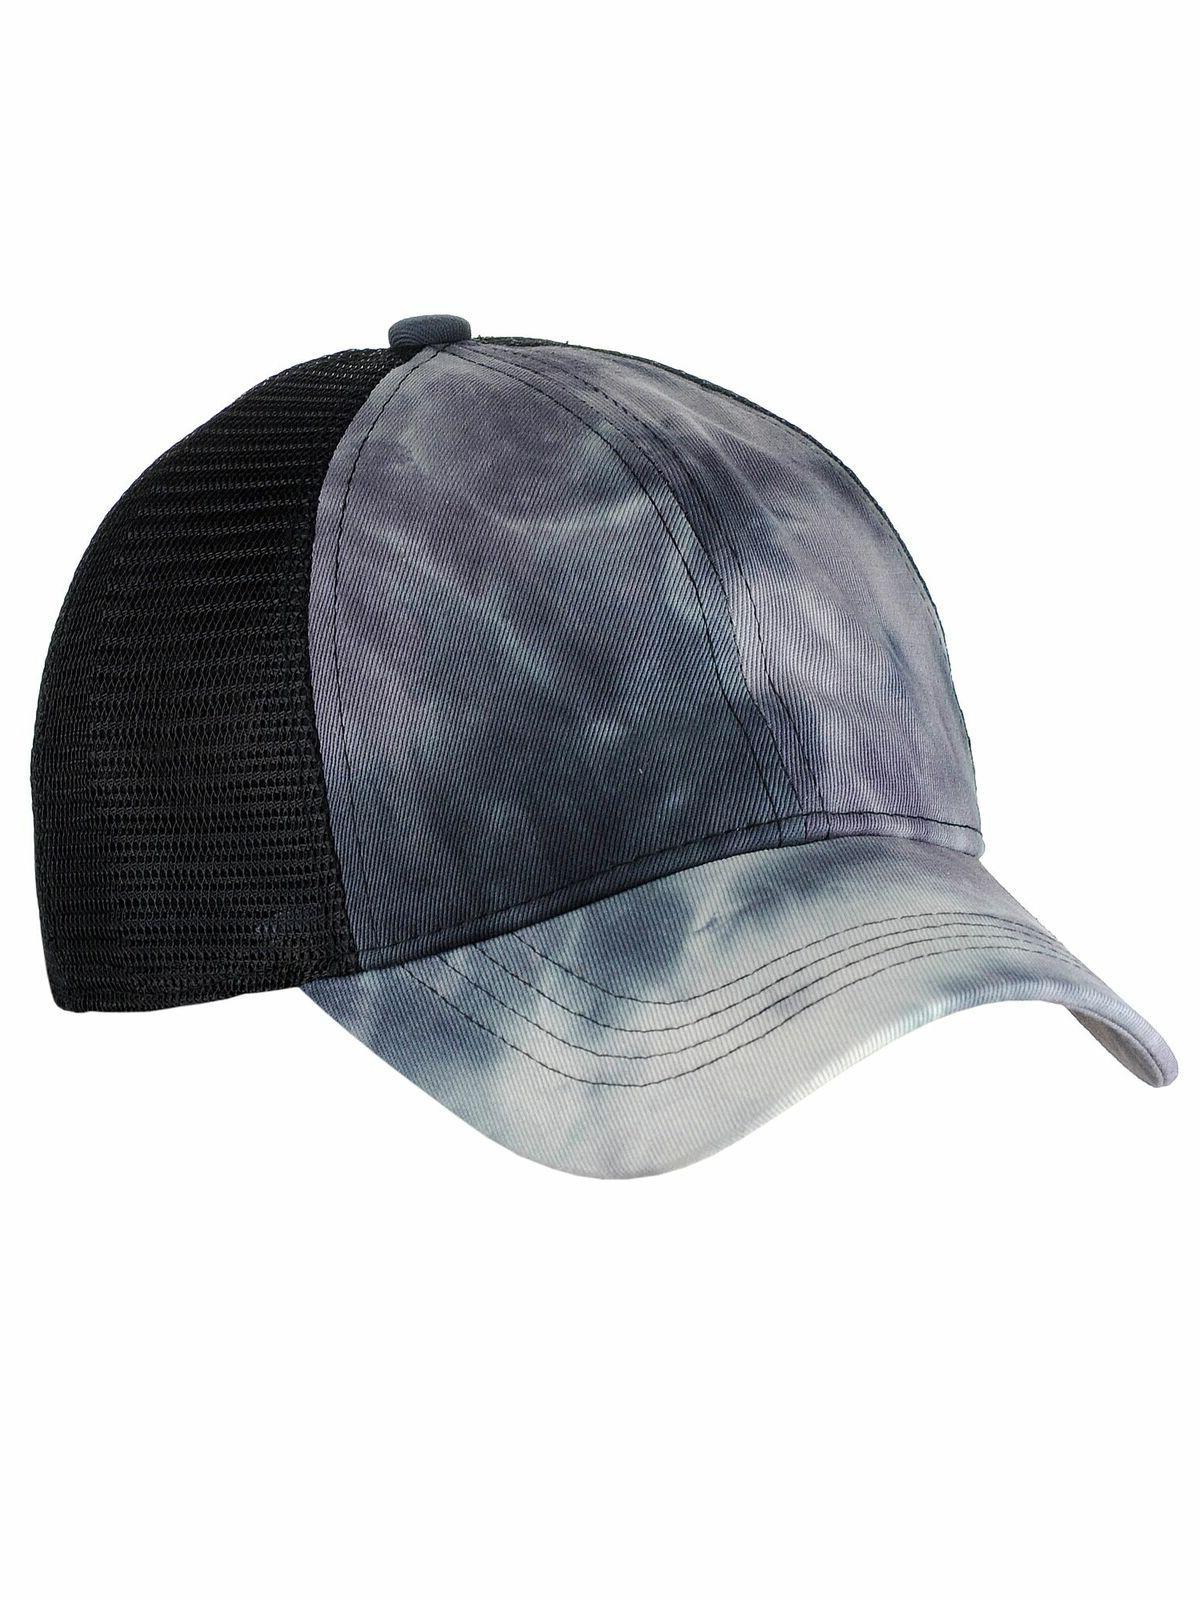 C.C Dye Mesh Cap